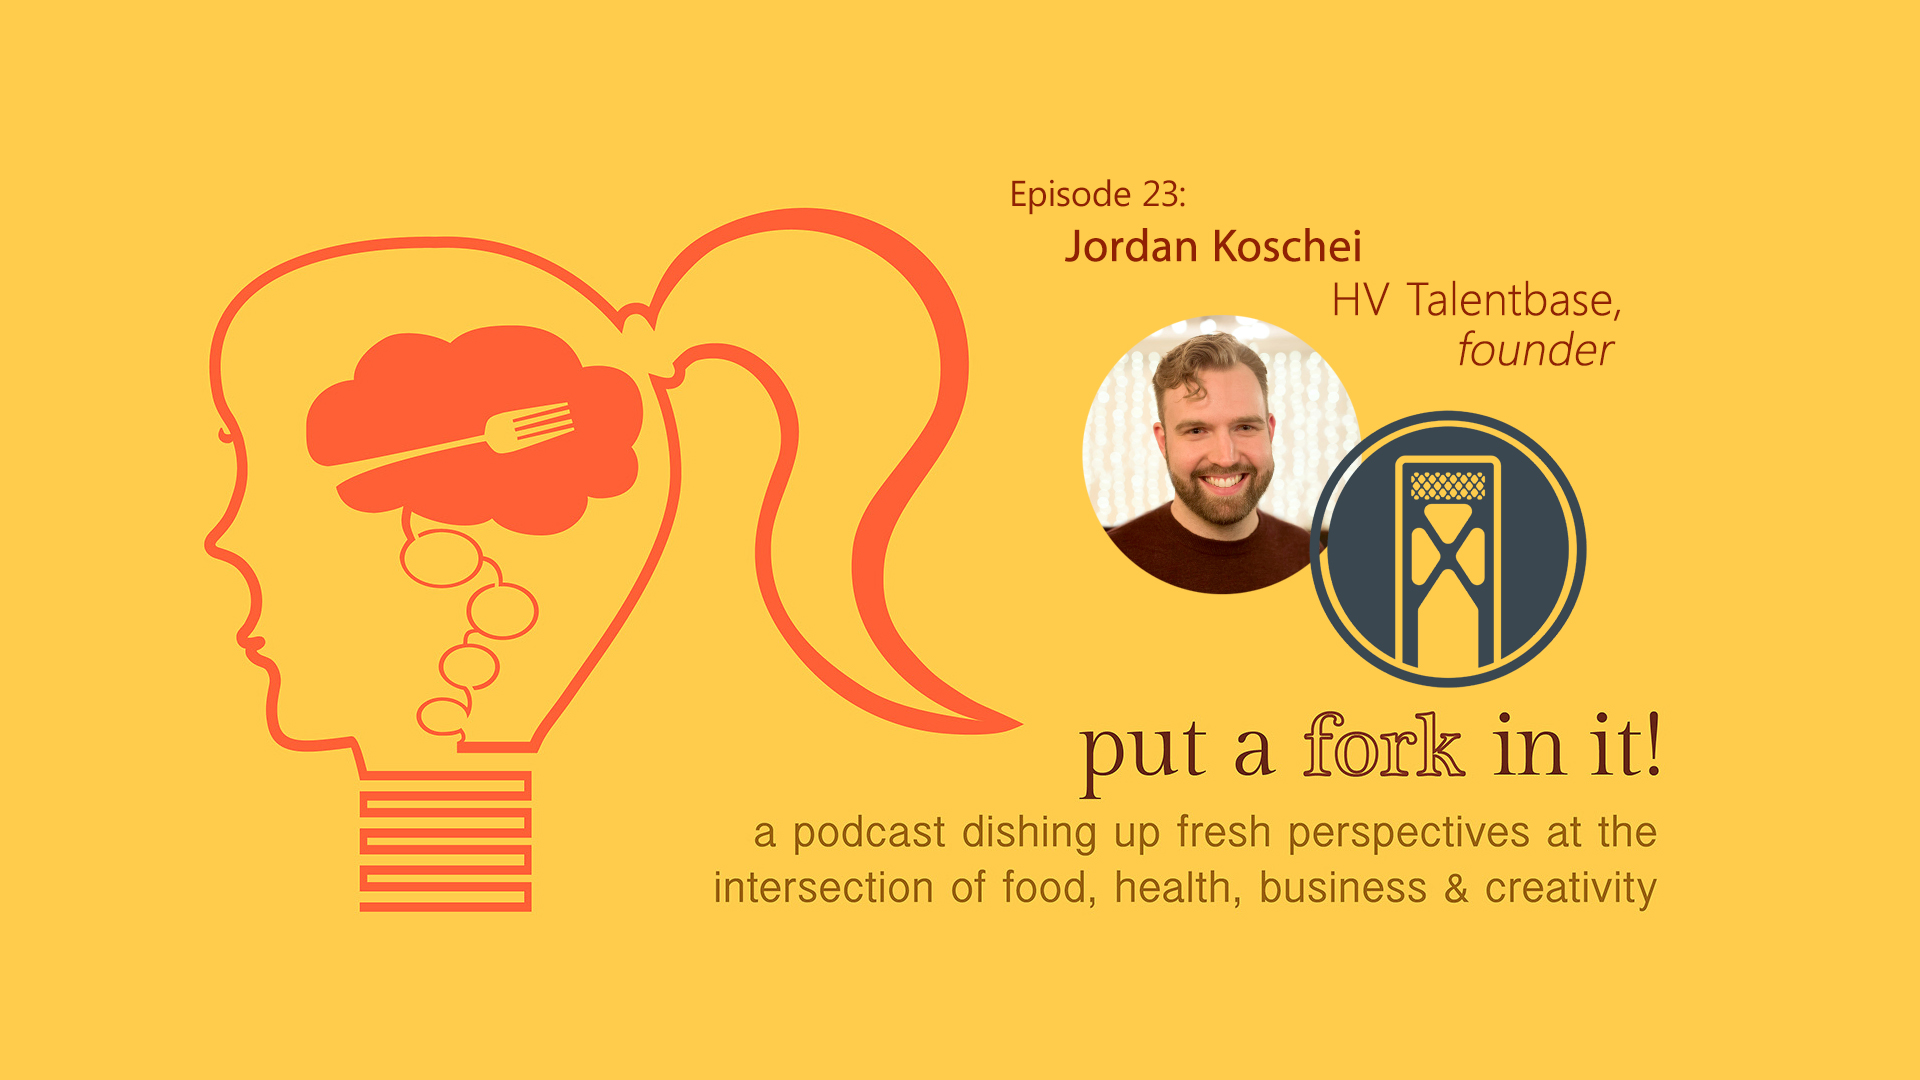 Episode 23: Jordan Koschei with HV Talentbase